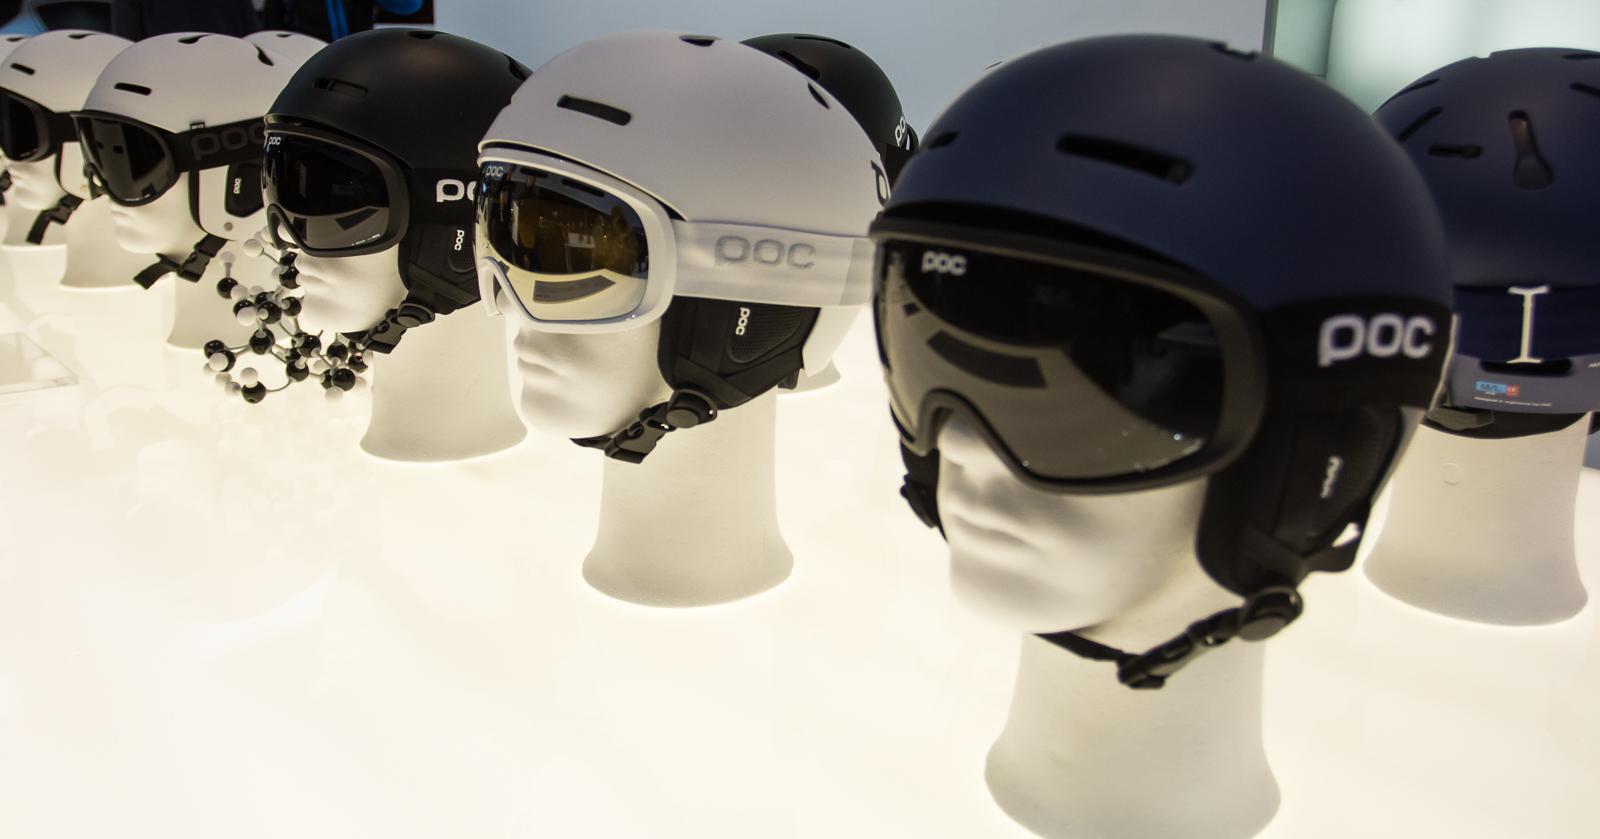 Die neuen Auric Cut Helme und Fovea Goggles